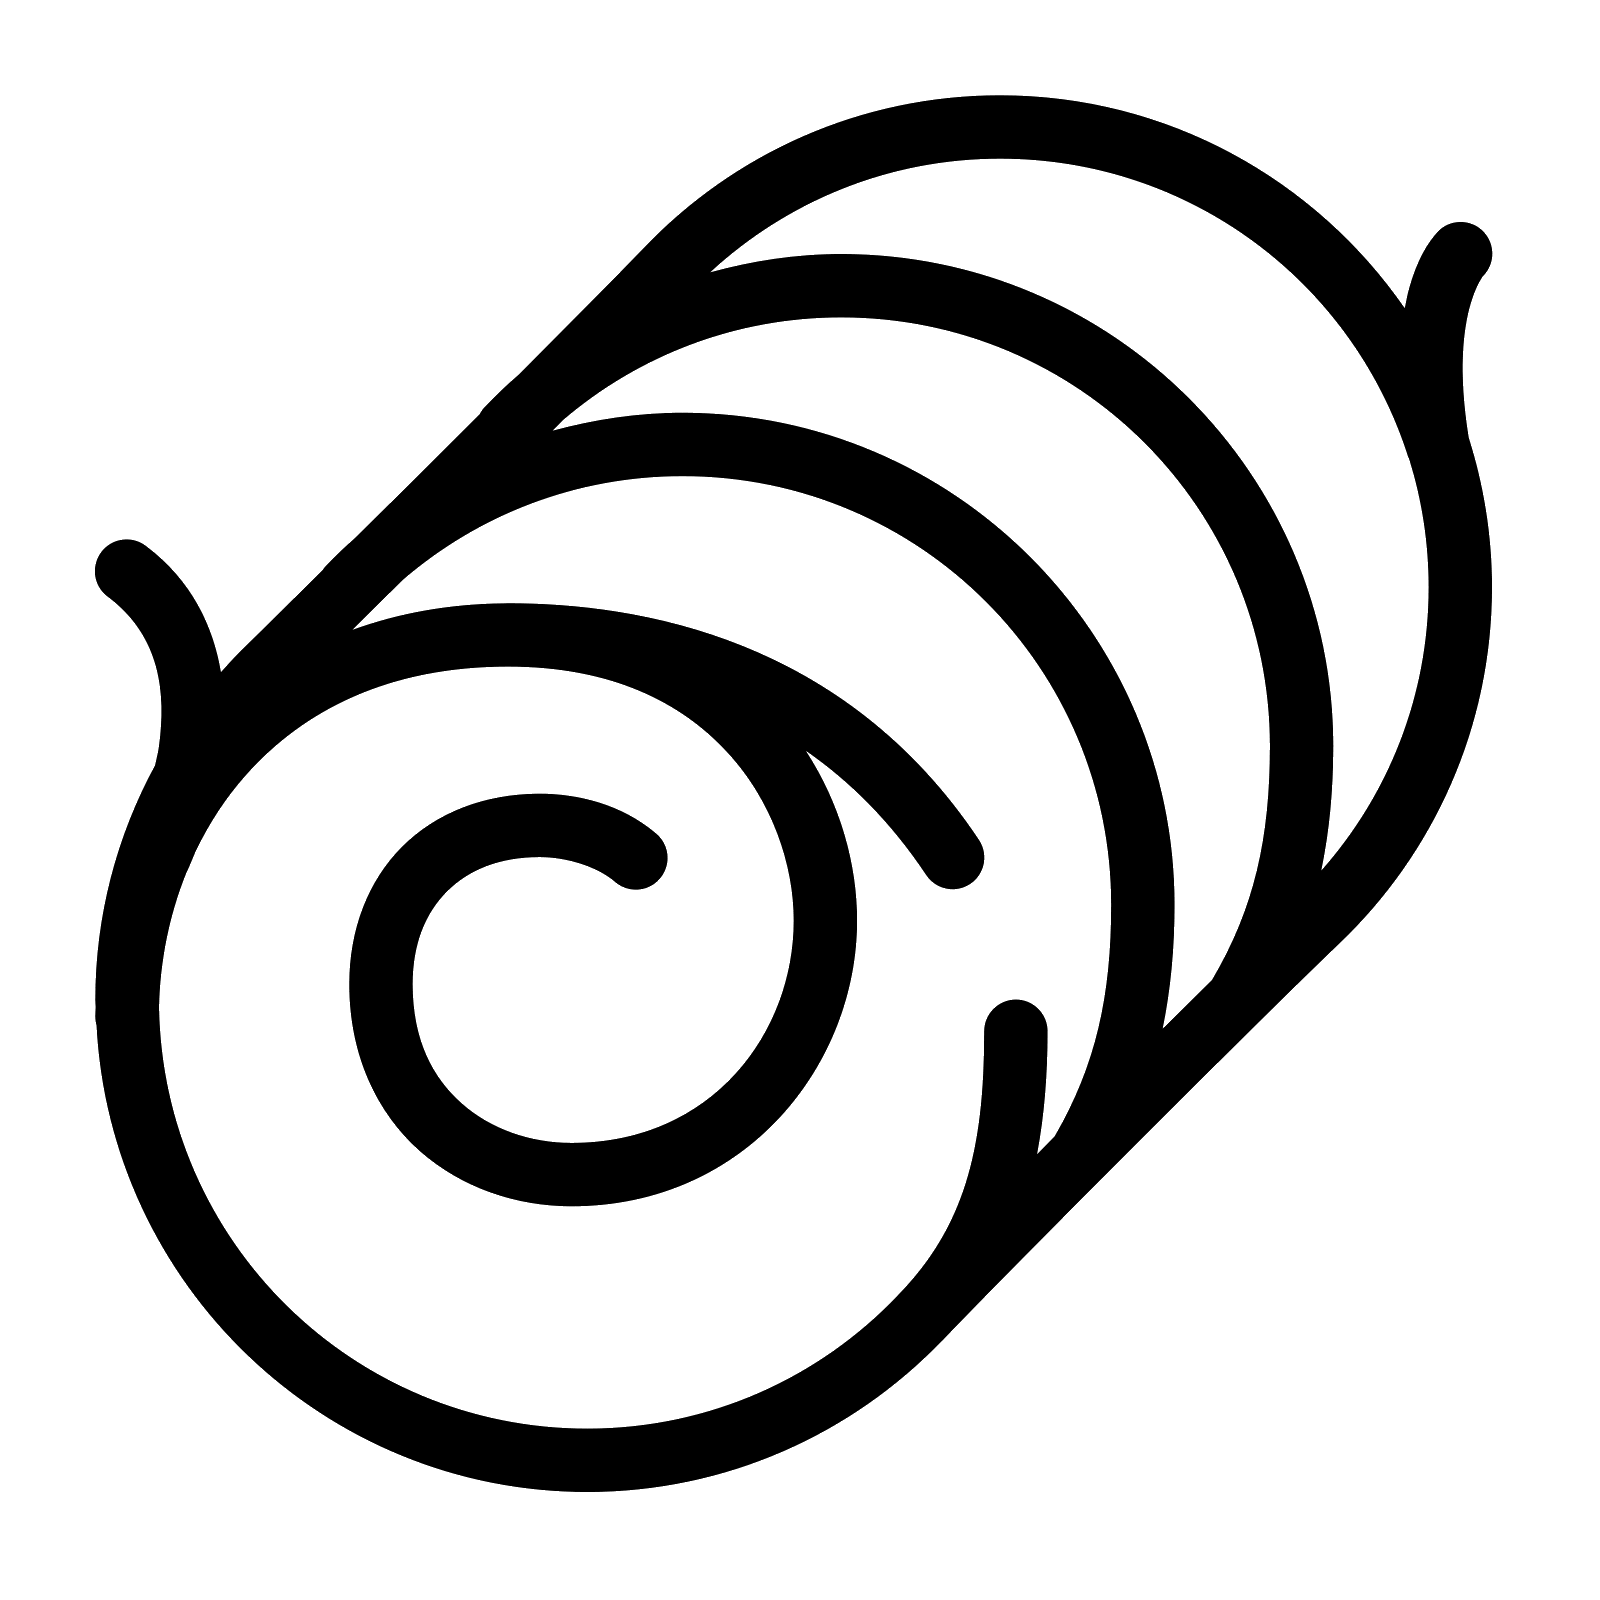 1600x1600 Hay Bale Icon